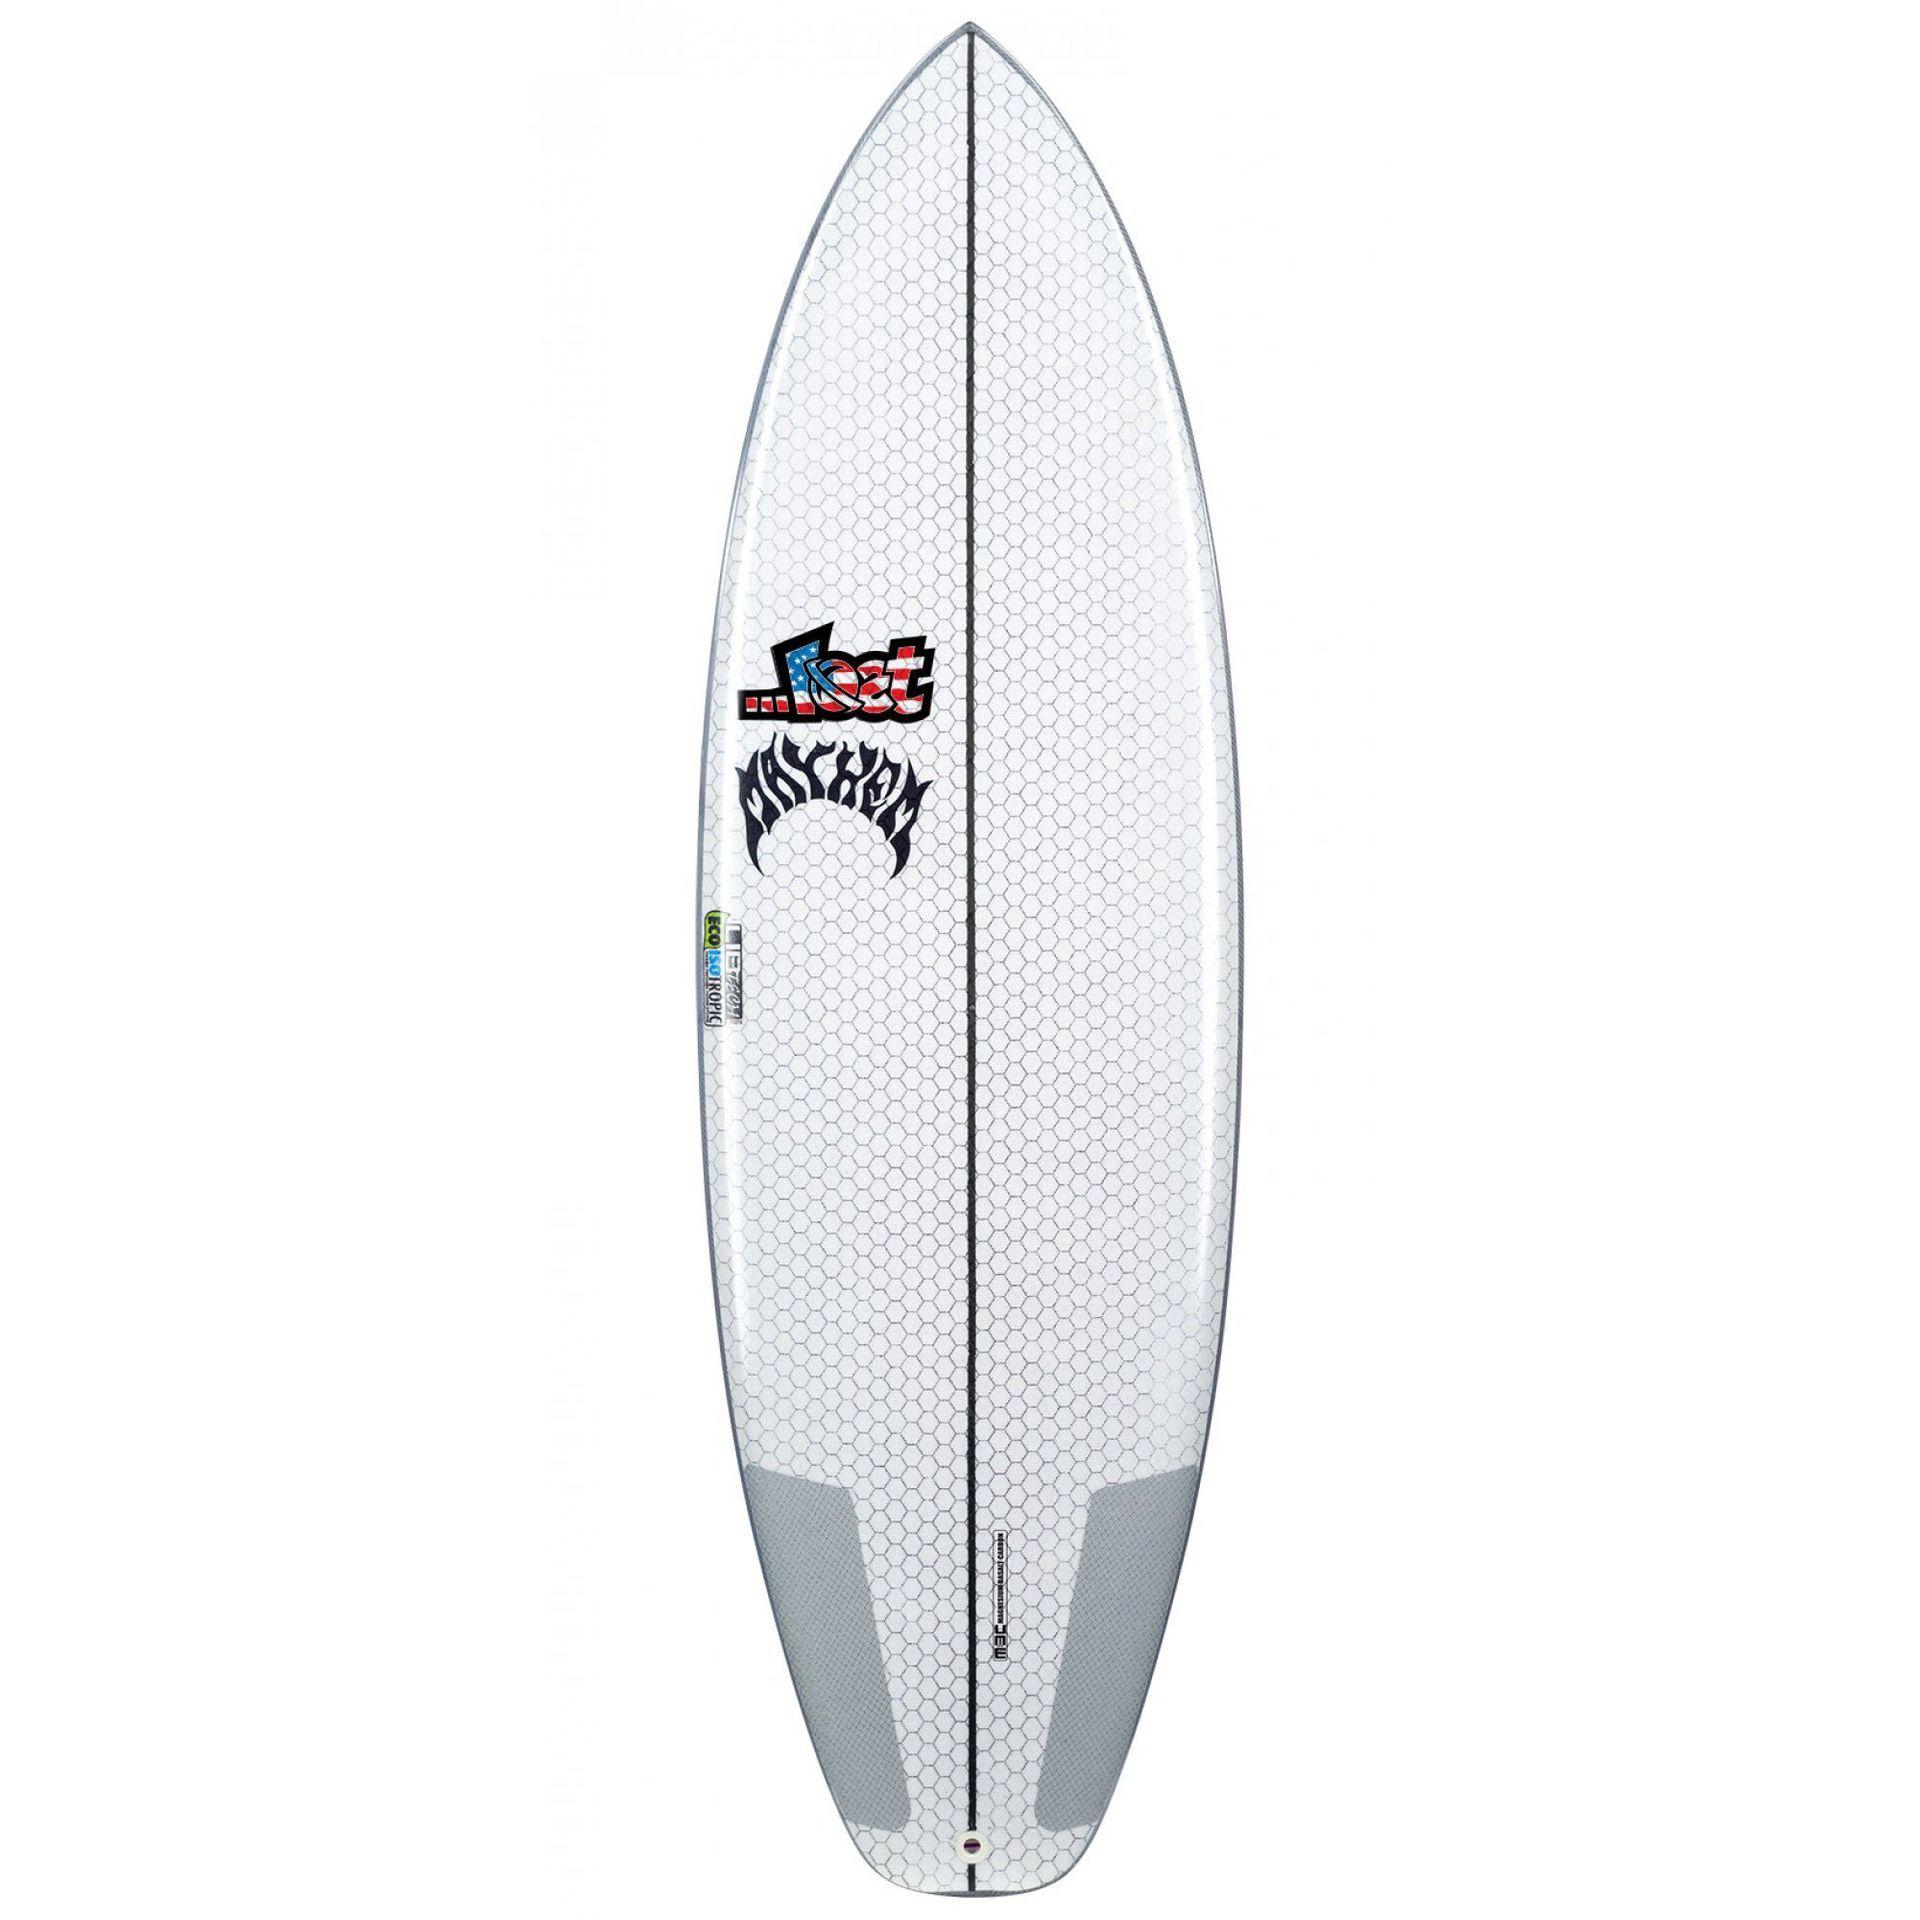 DESKA SURFINGOWA LIB TECH LOST SHORT ROUND 1